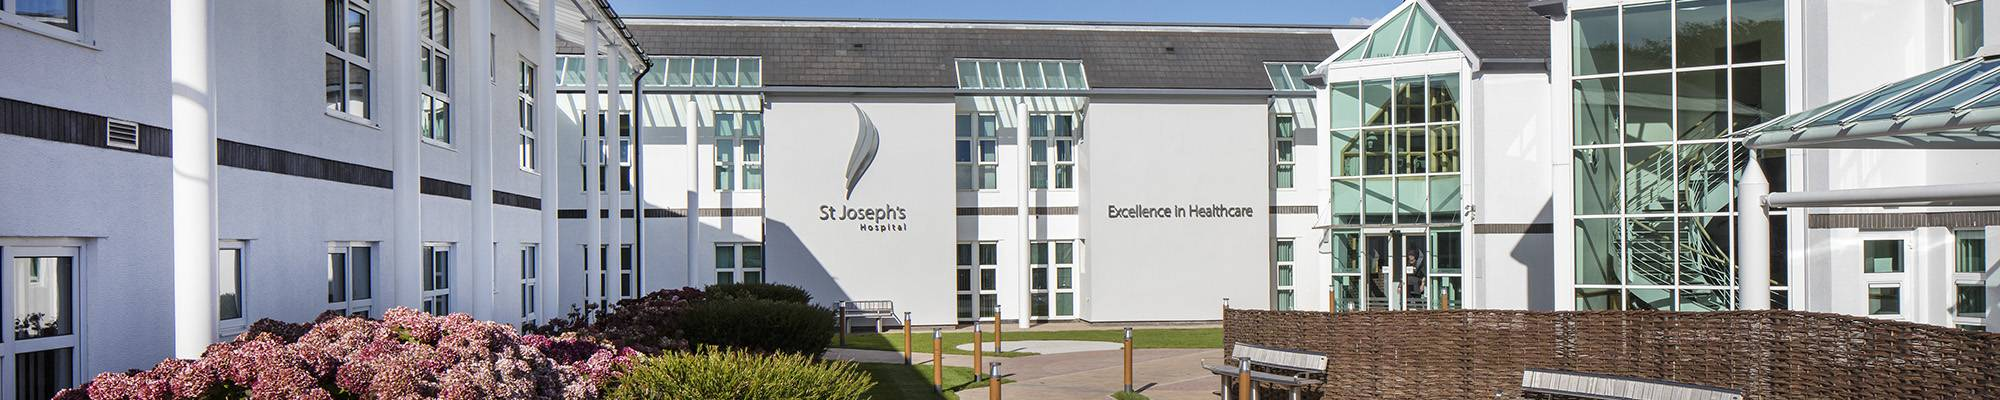 Front Entrance to St. Joseph's Hospital